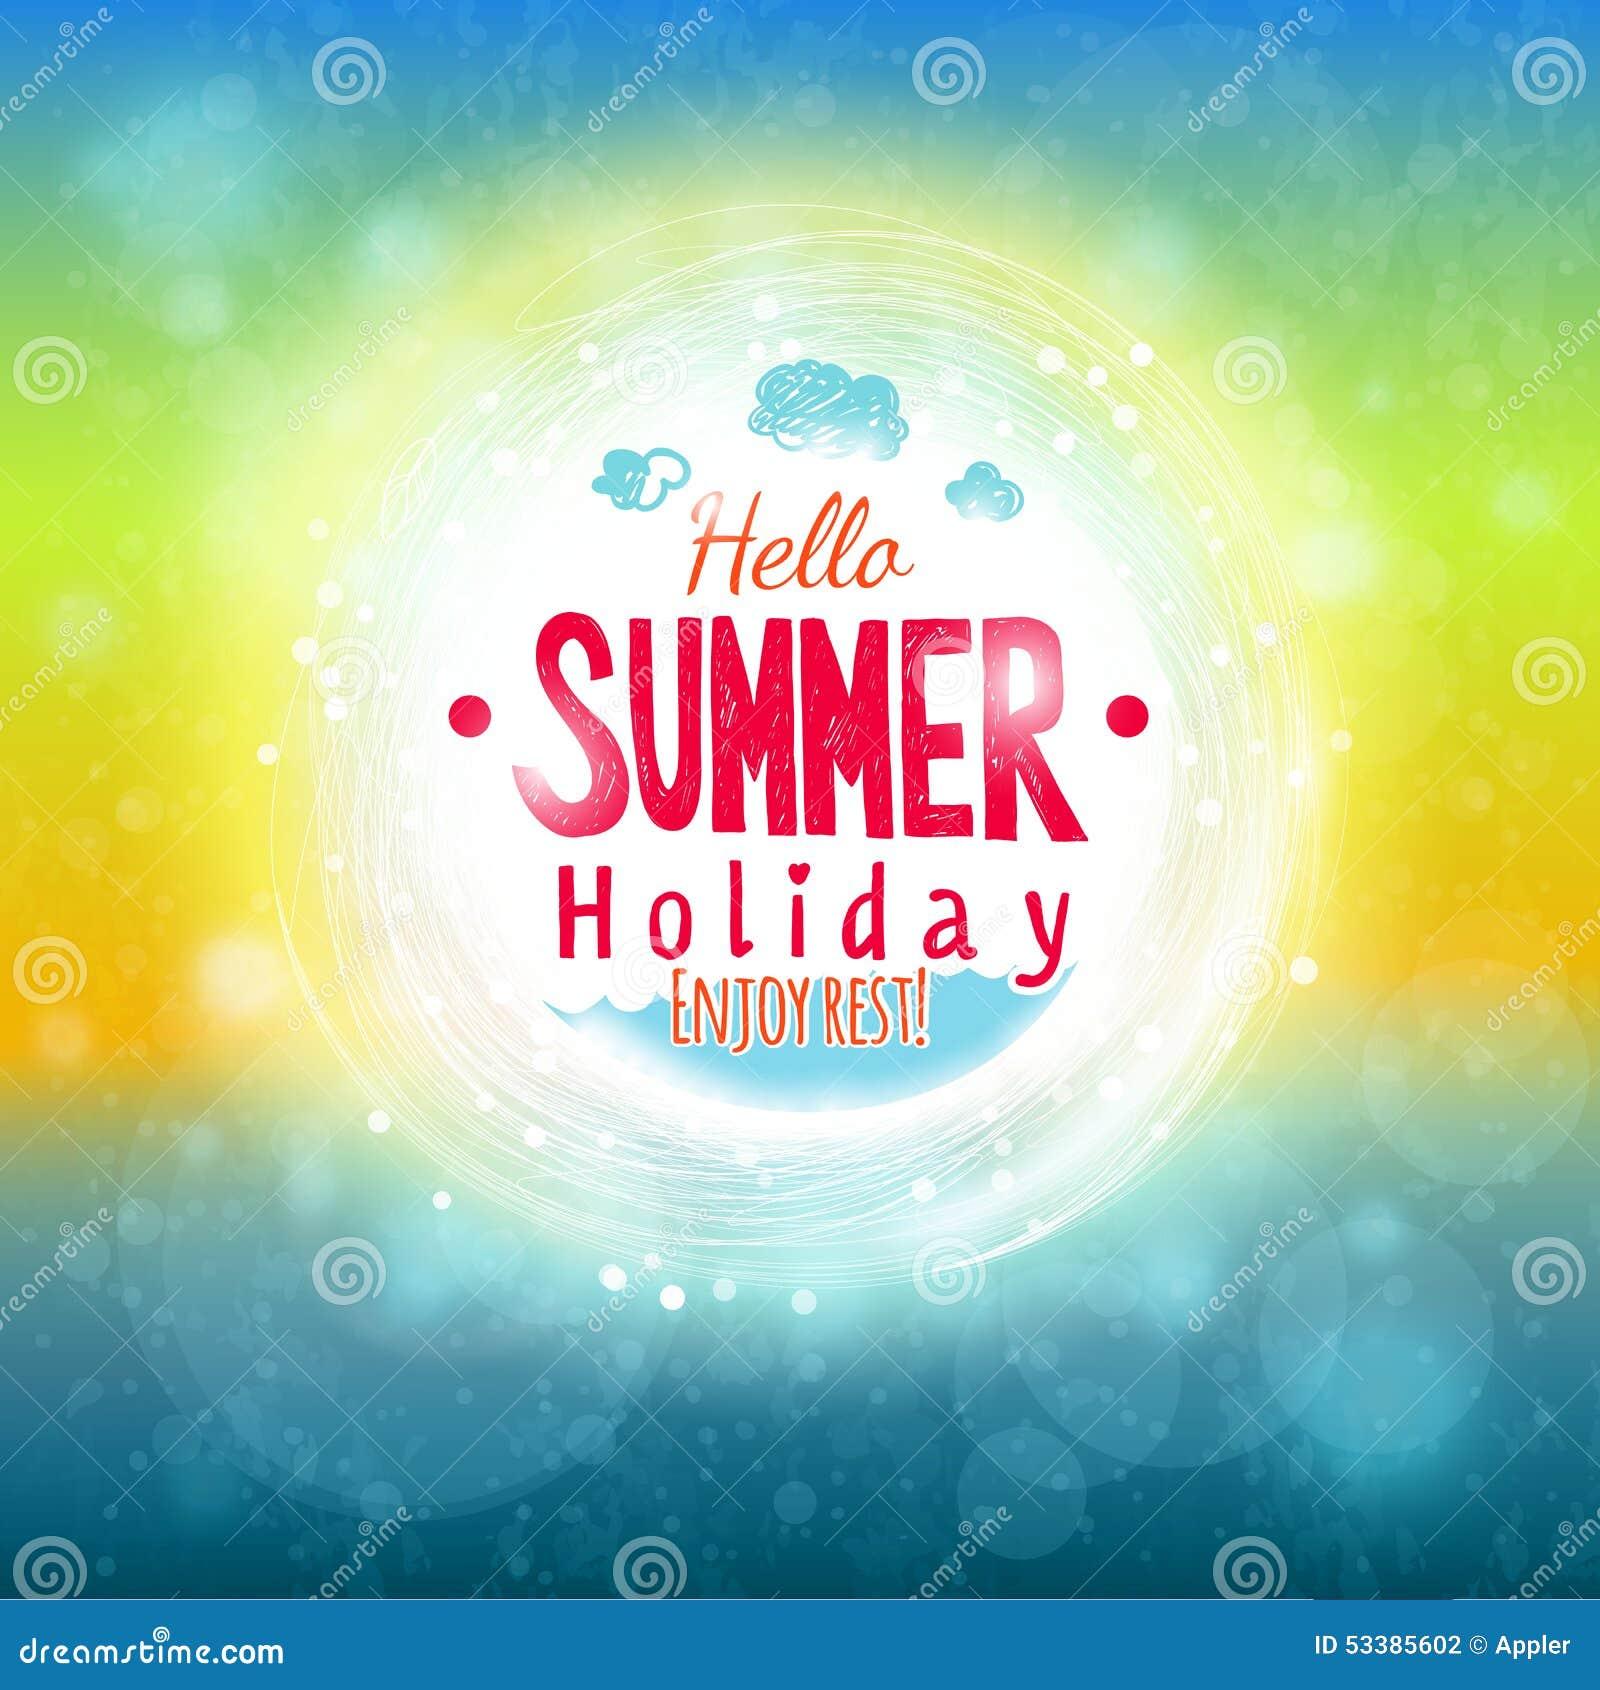 Hello Summer Sky And Sea Drawing Card Nice Look